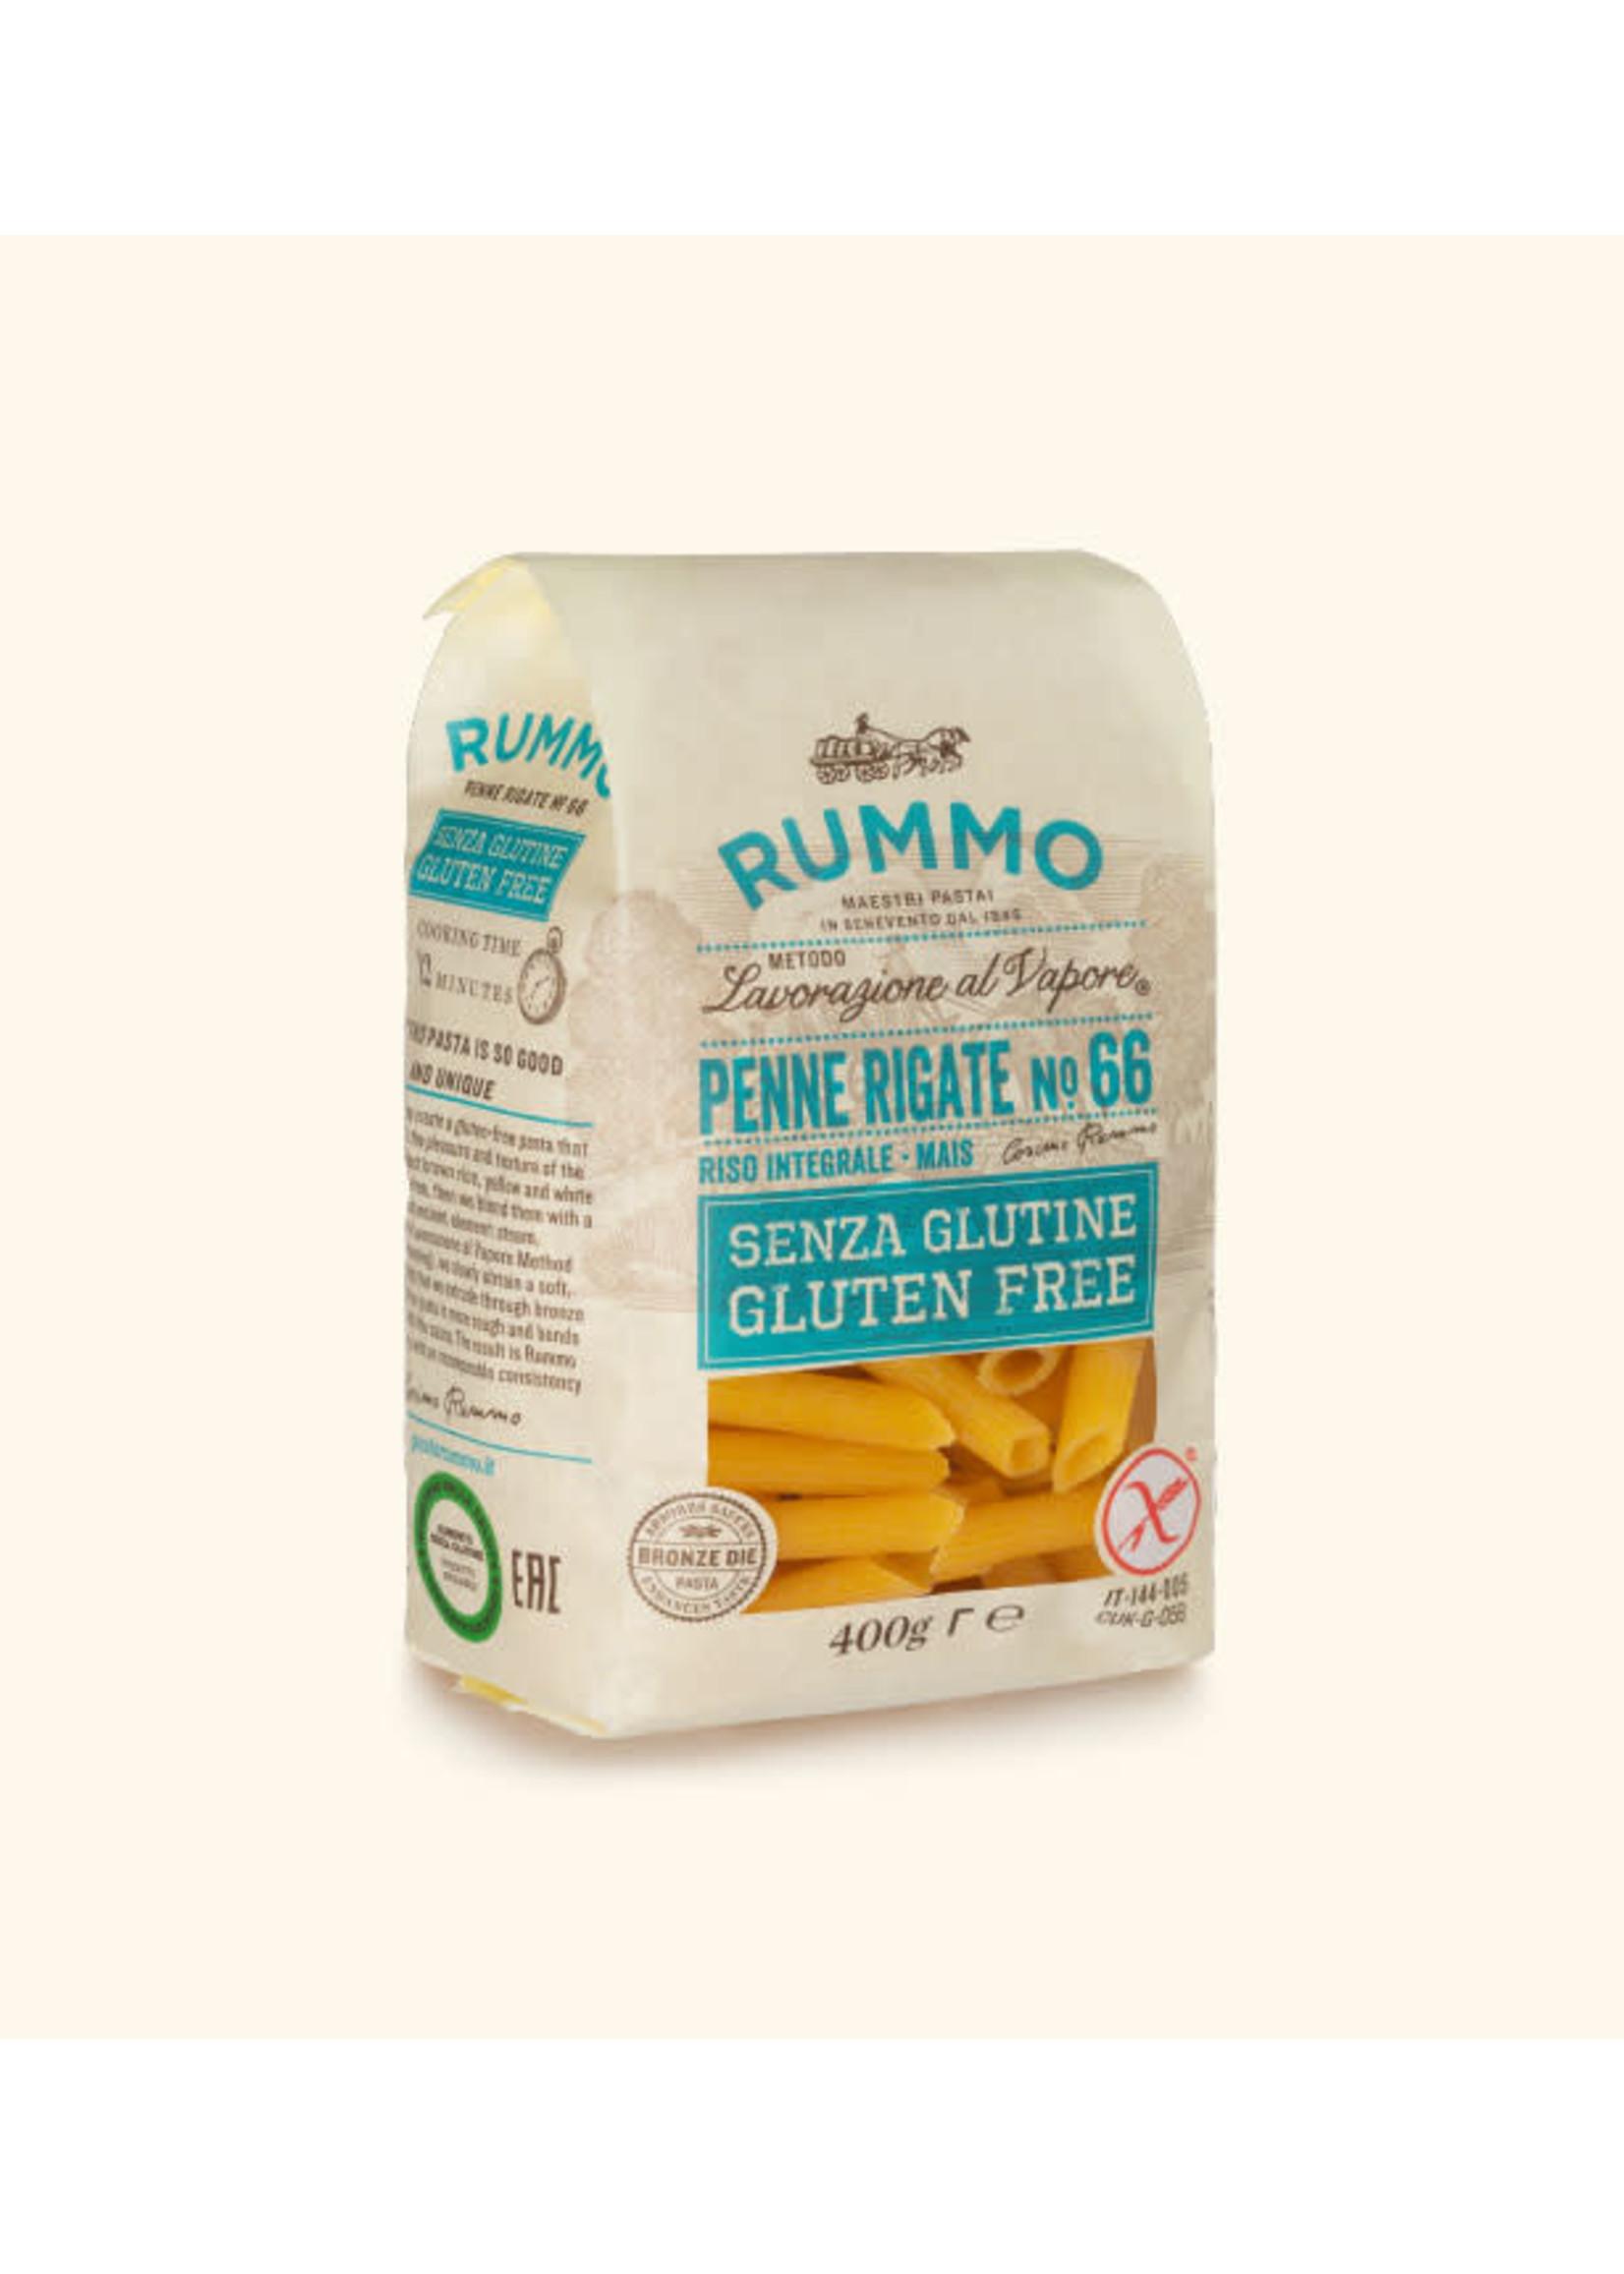 Rummo Pasta Gluten Free Rummo Penne no66